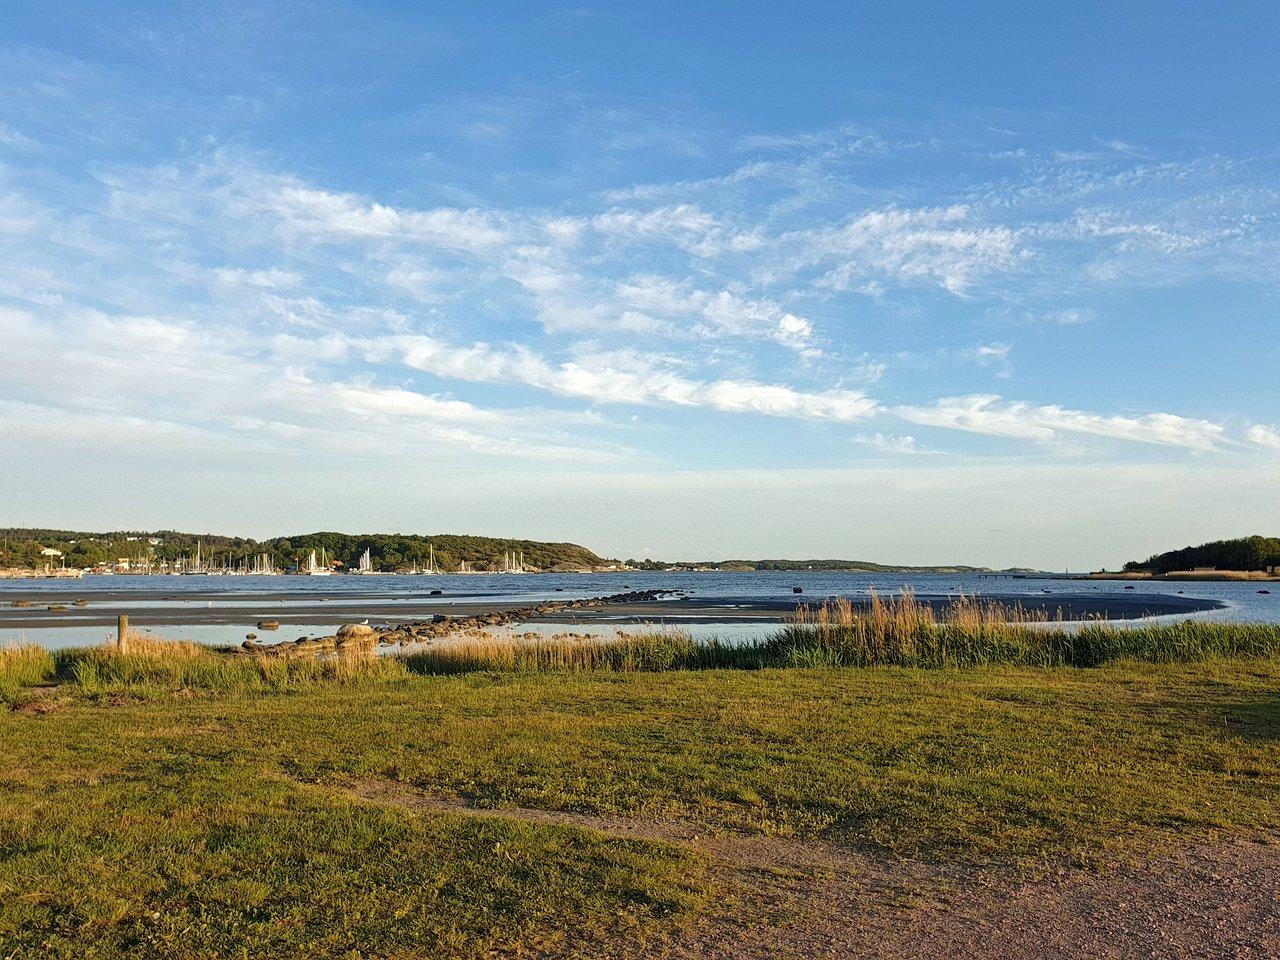 Luxway Nordic - Askim, Vstra Gtalands Ln, Sweden